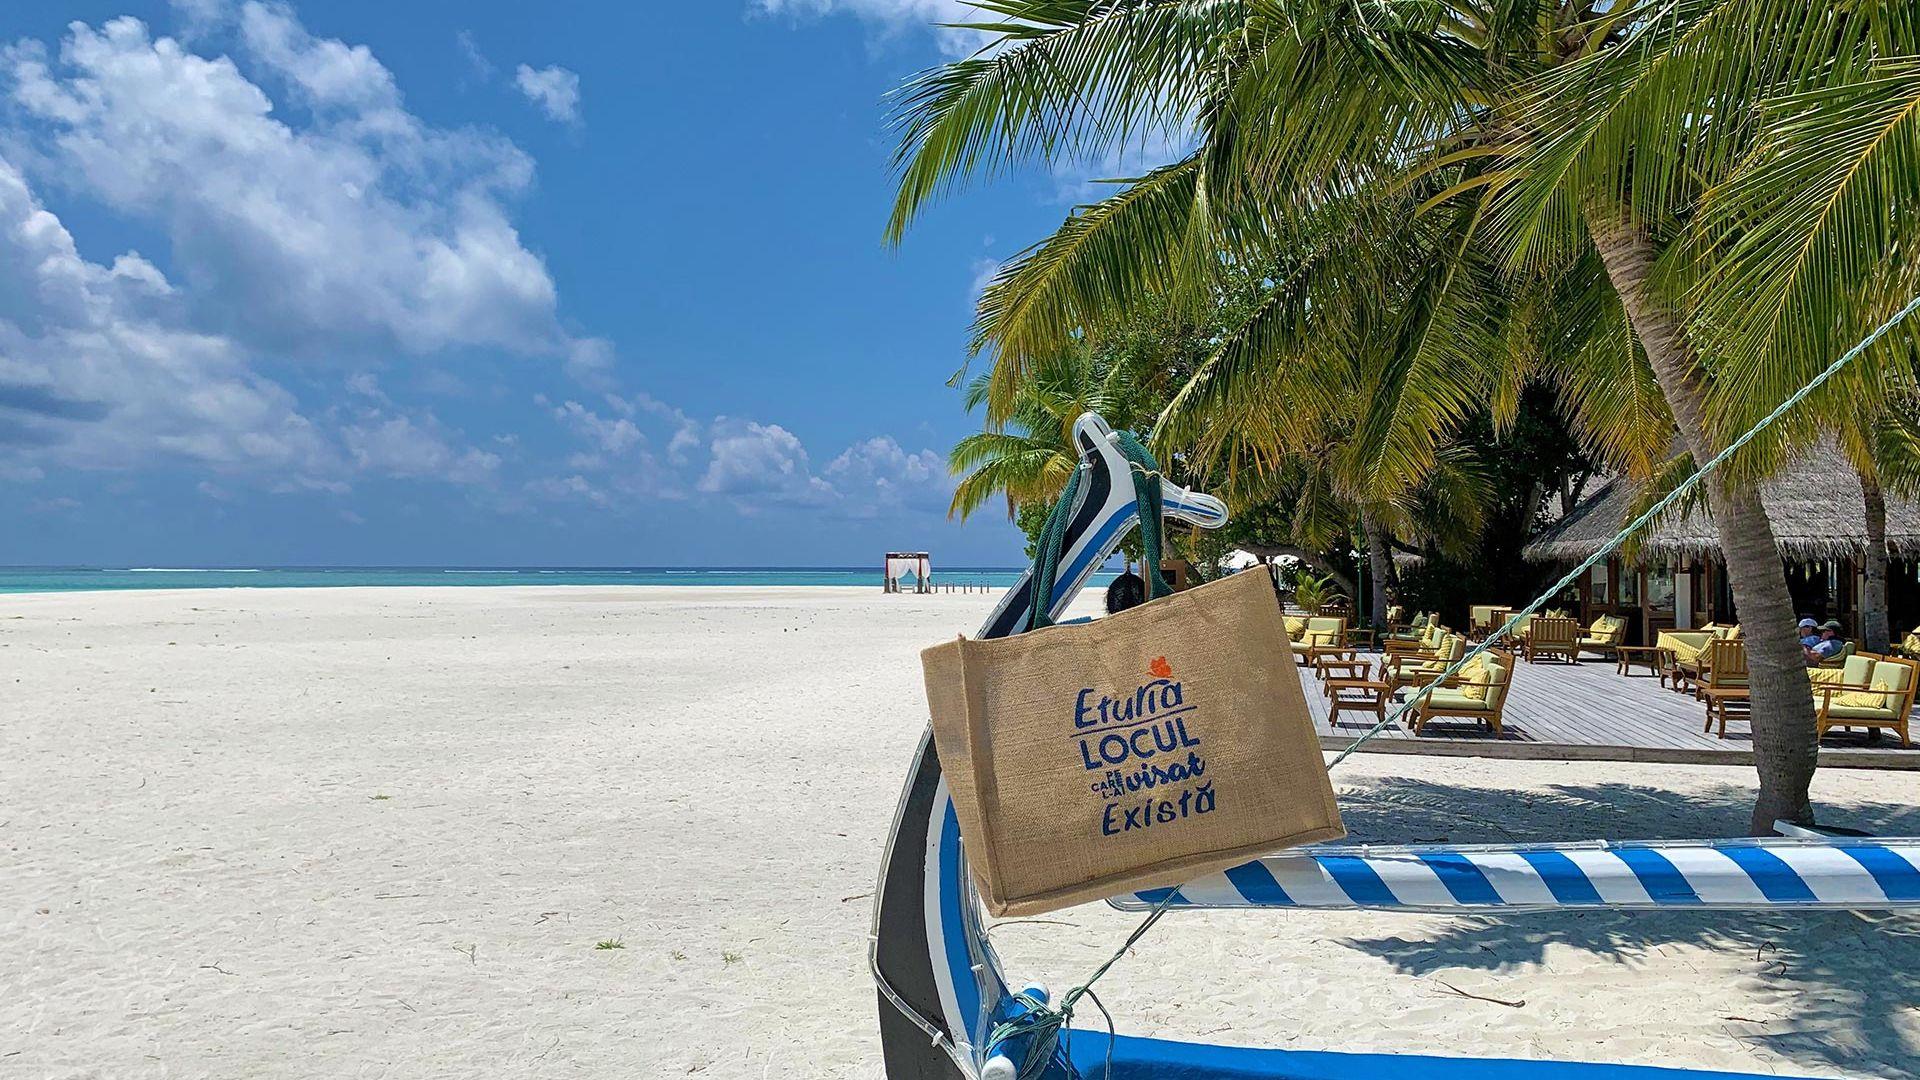 Sejur plaja Maldive, 10 zile - martie 2022